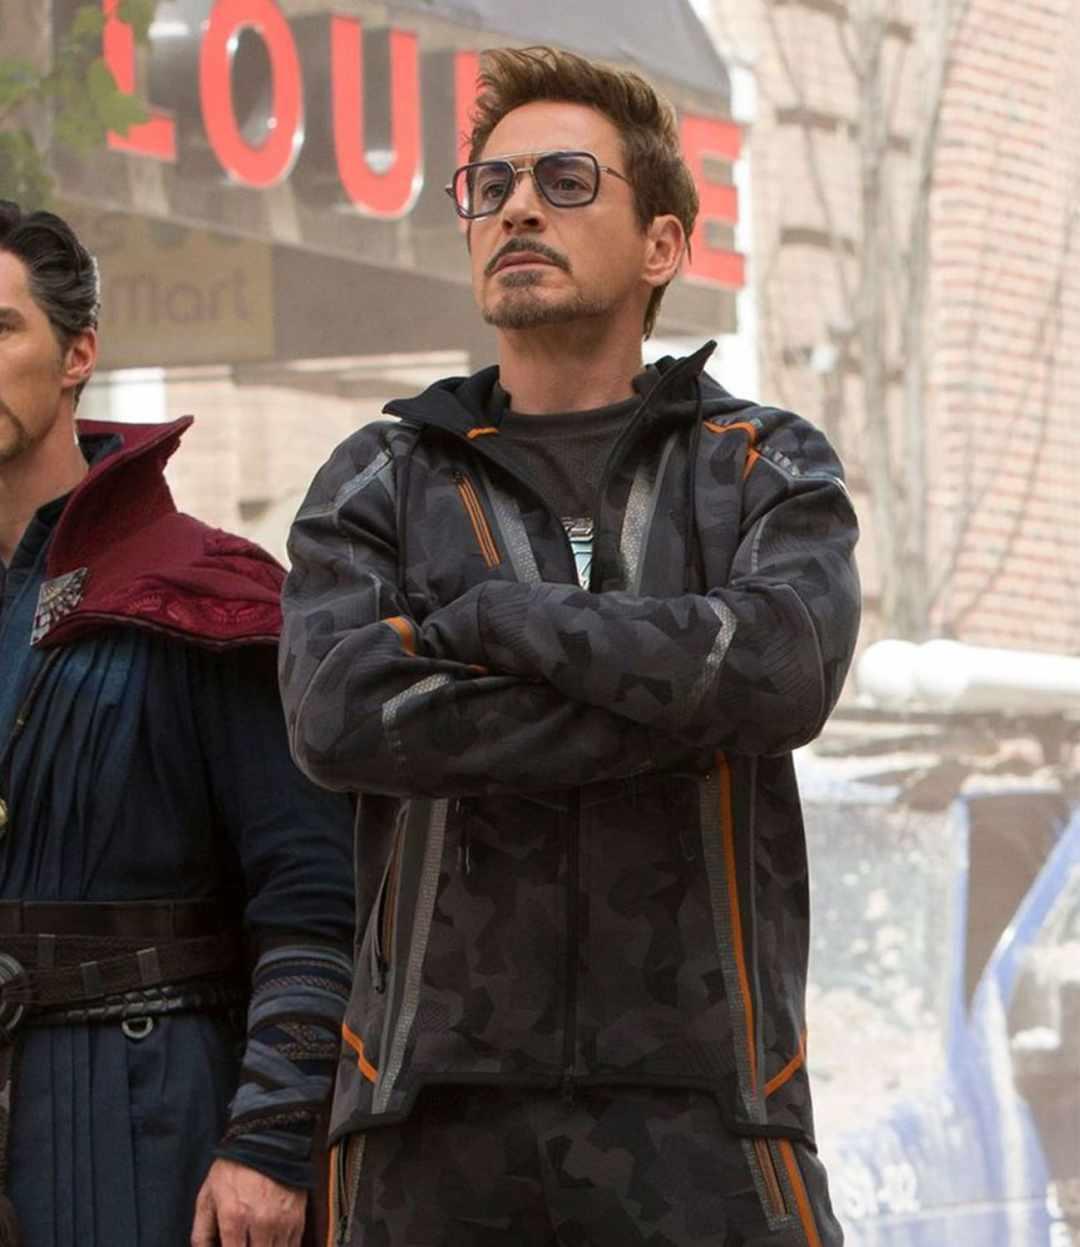 image Look de Tony Stark dans Avengers Infinity War (Veste et Lunettes) 7